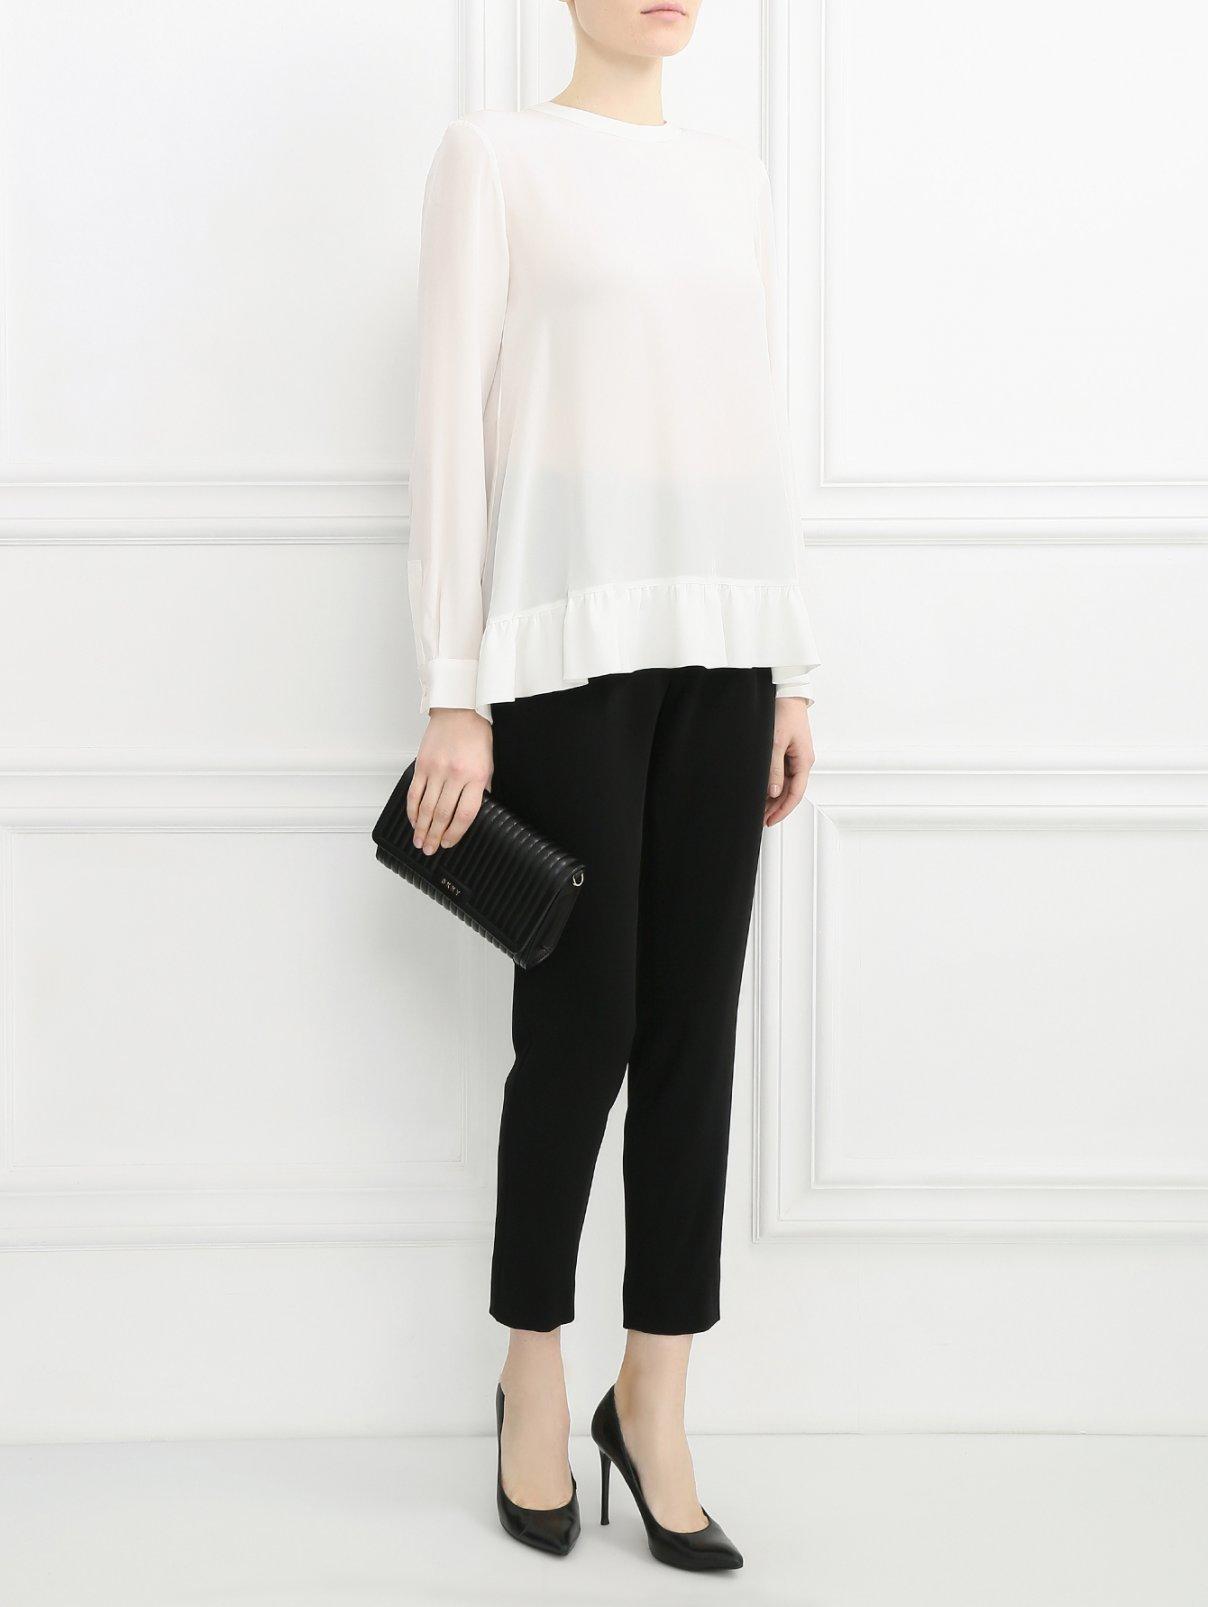 Блуза из шелка Rossella Jardini  –  Модель Общий вид  – Цвет:  Белый